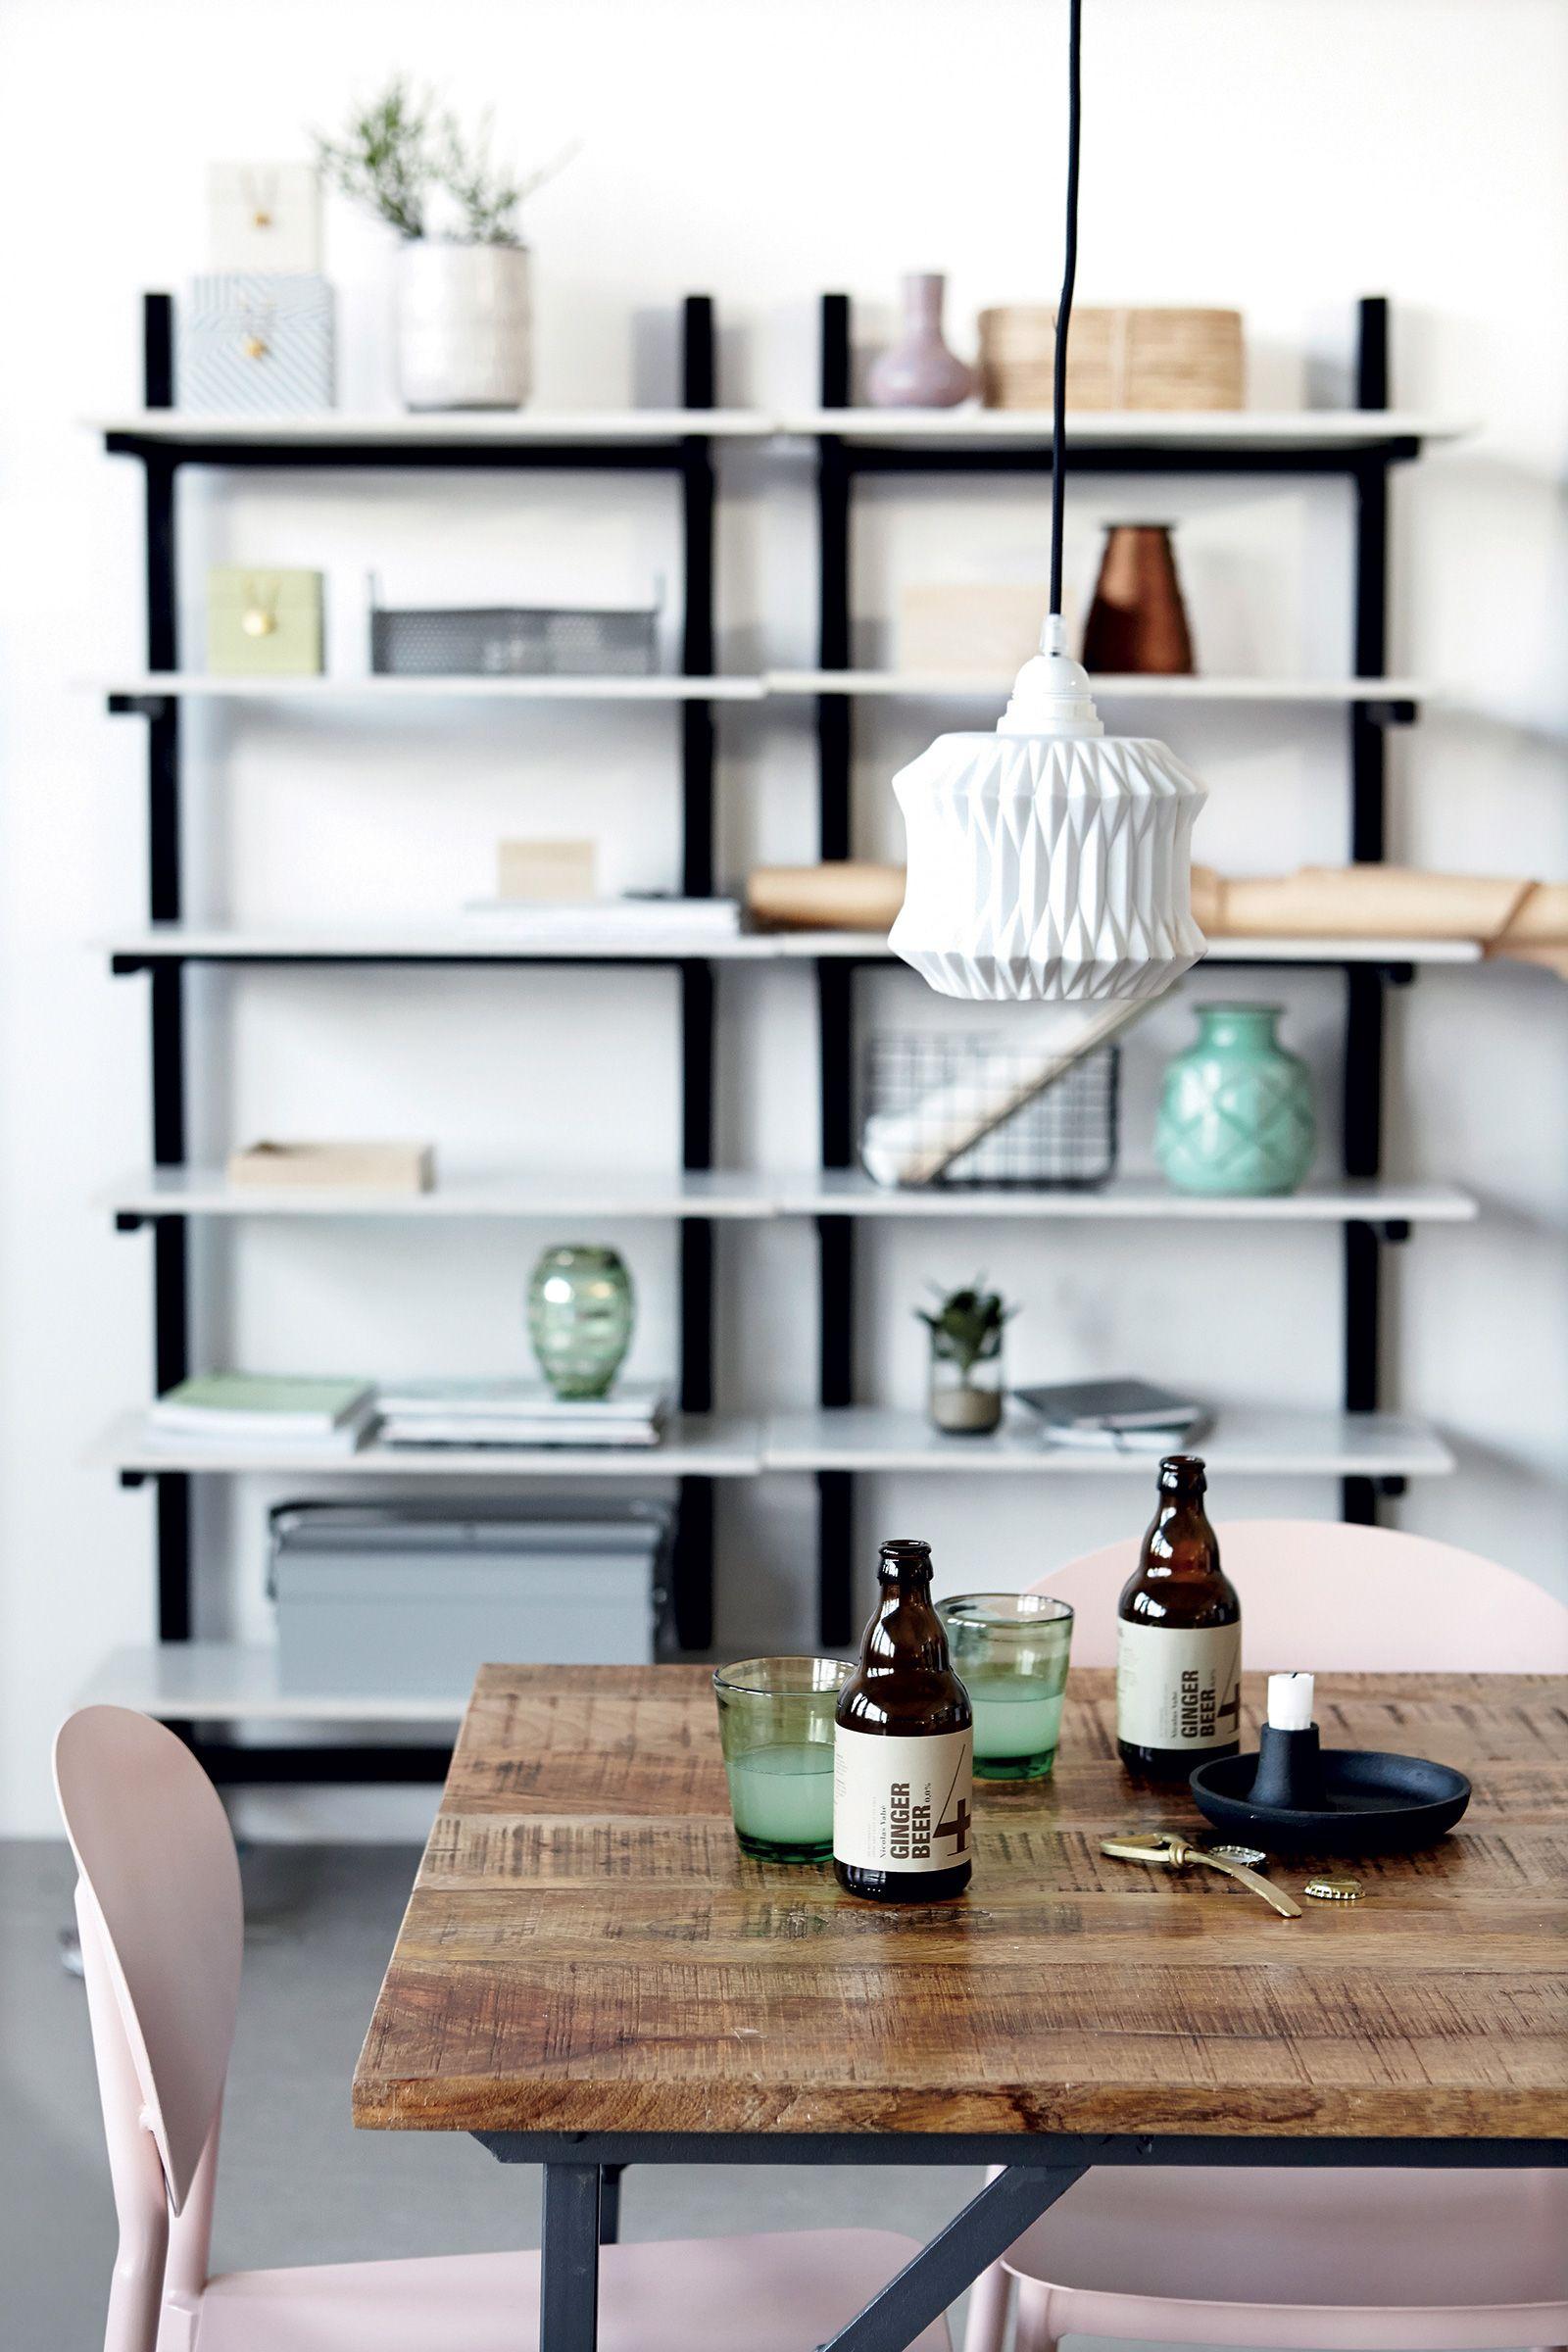 House doctor objets déco et mobilier scandinave